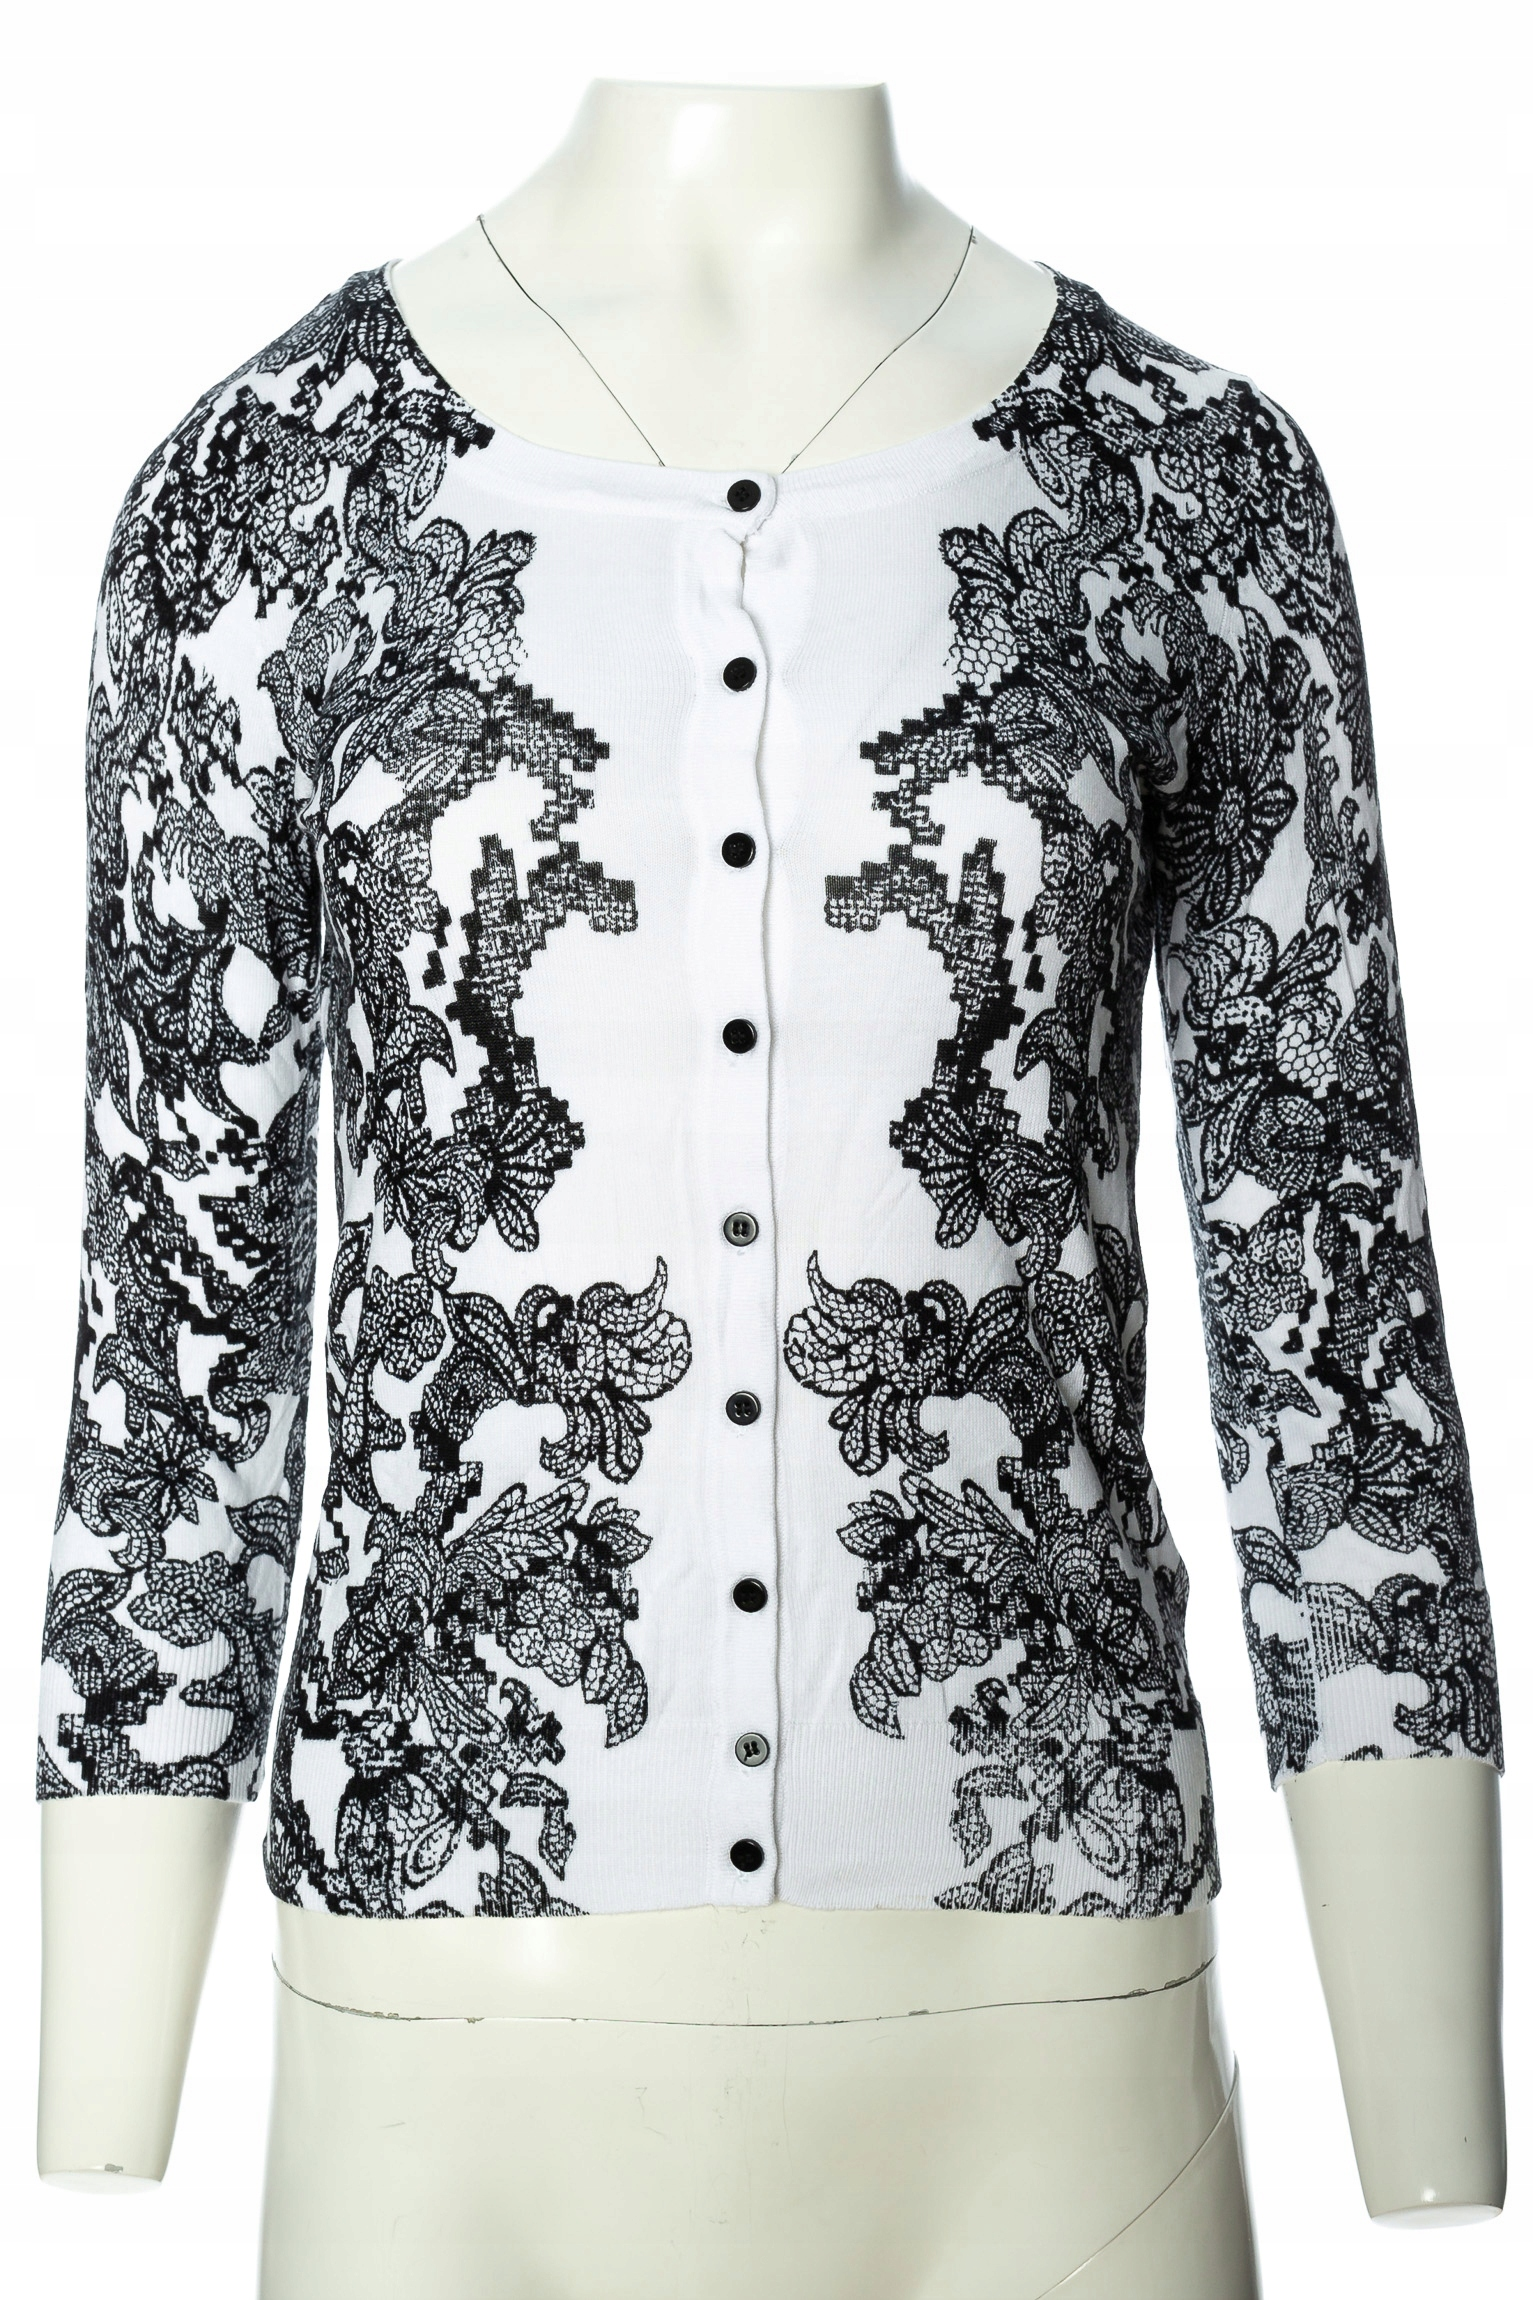 H&M biało czarny rozpinany sweterek r.SM 7472502088